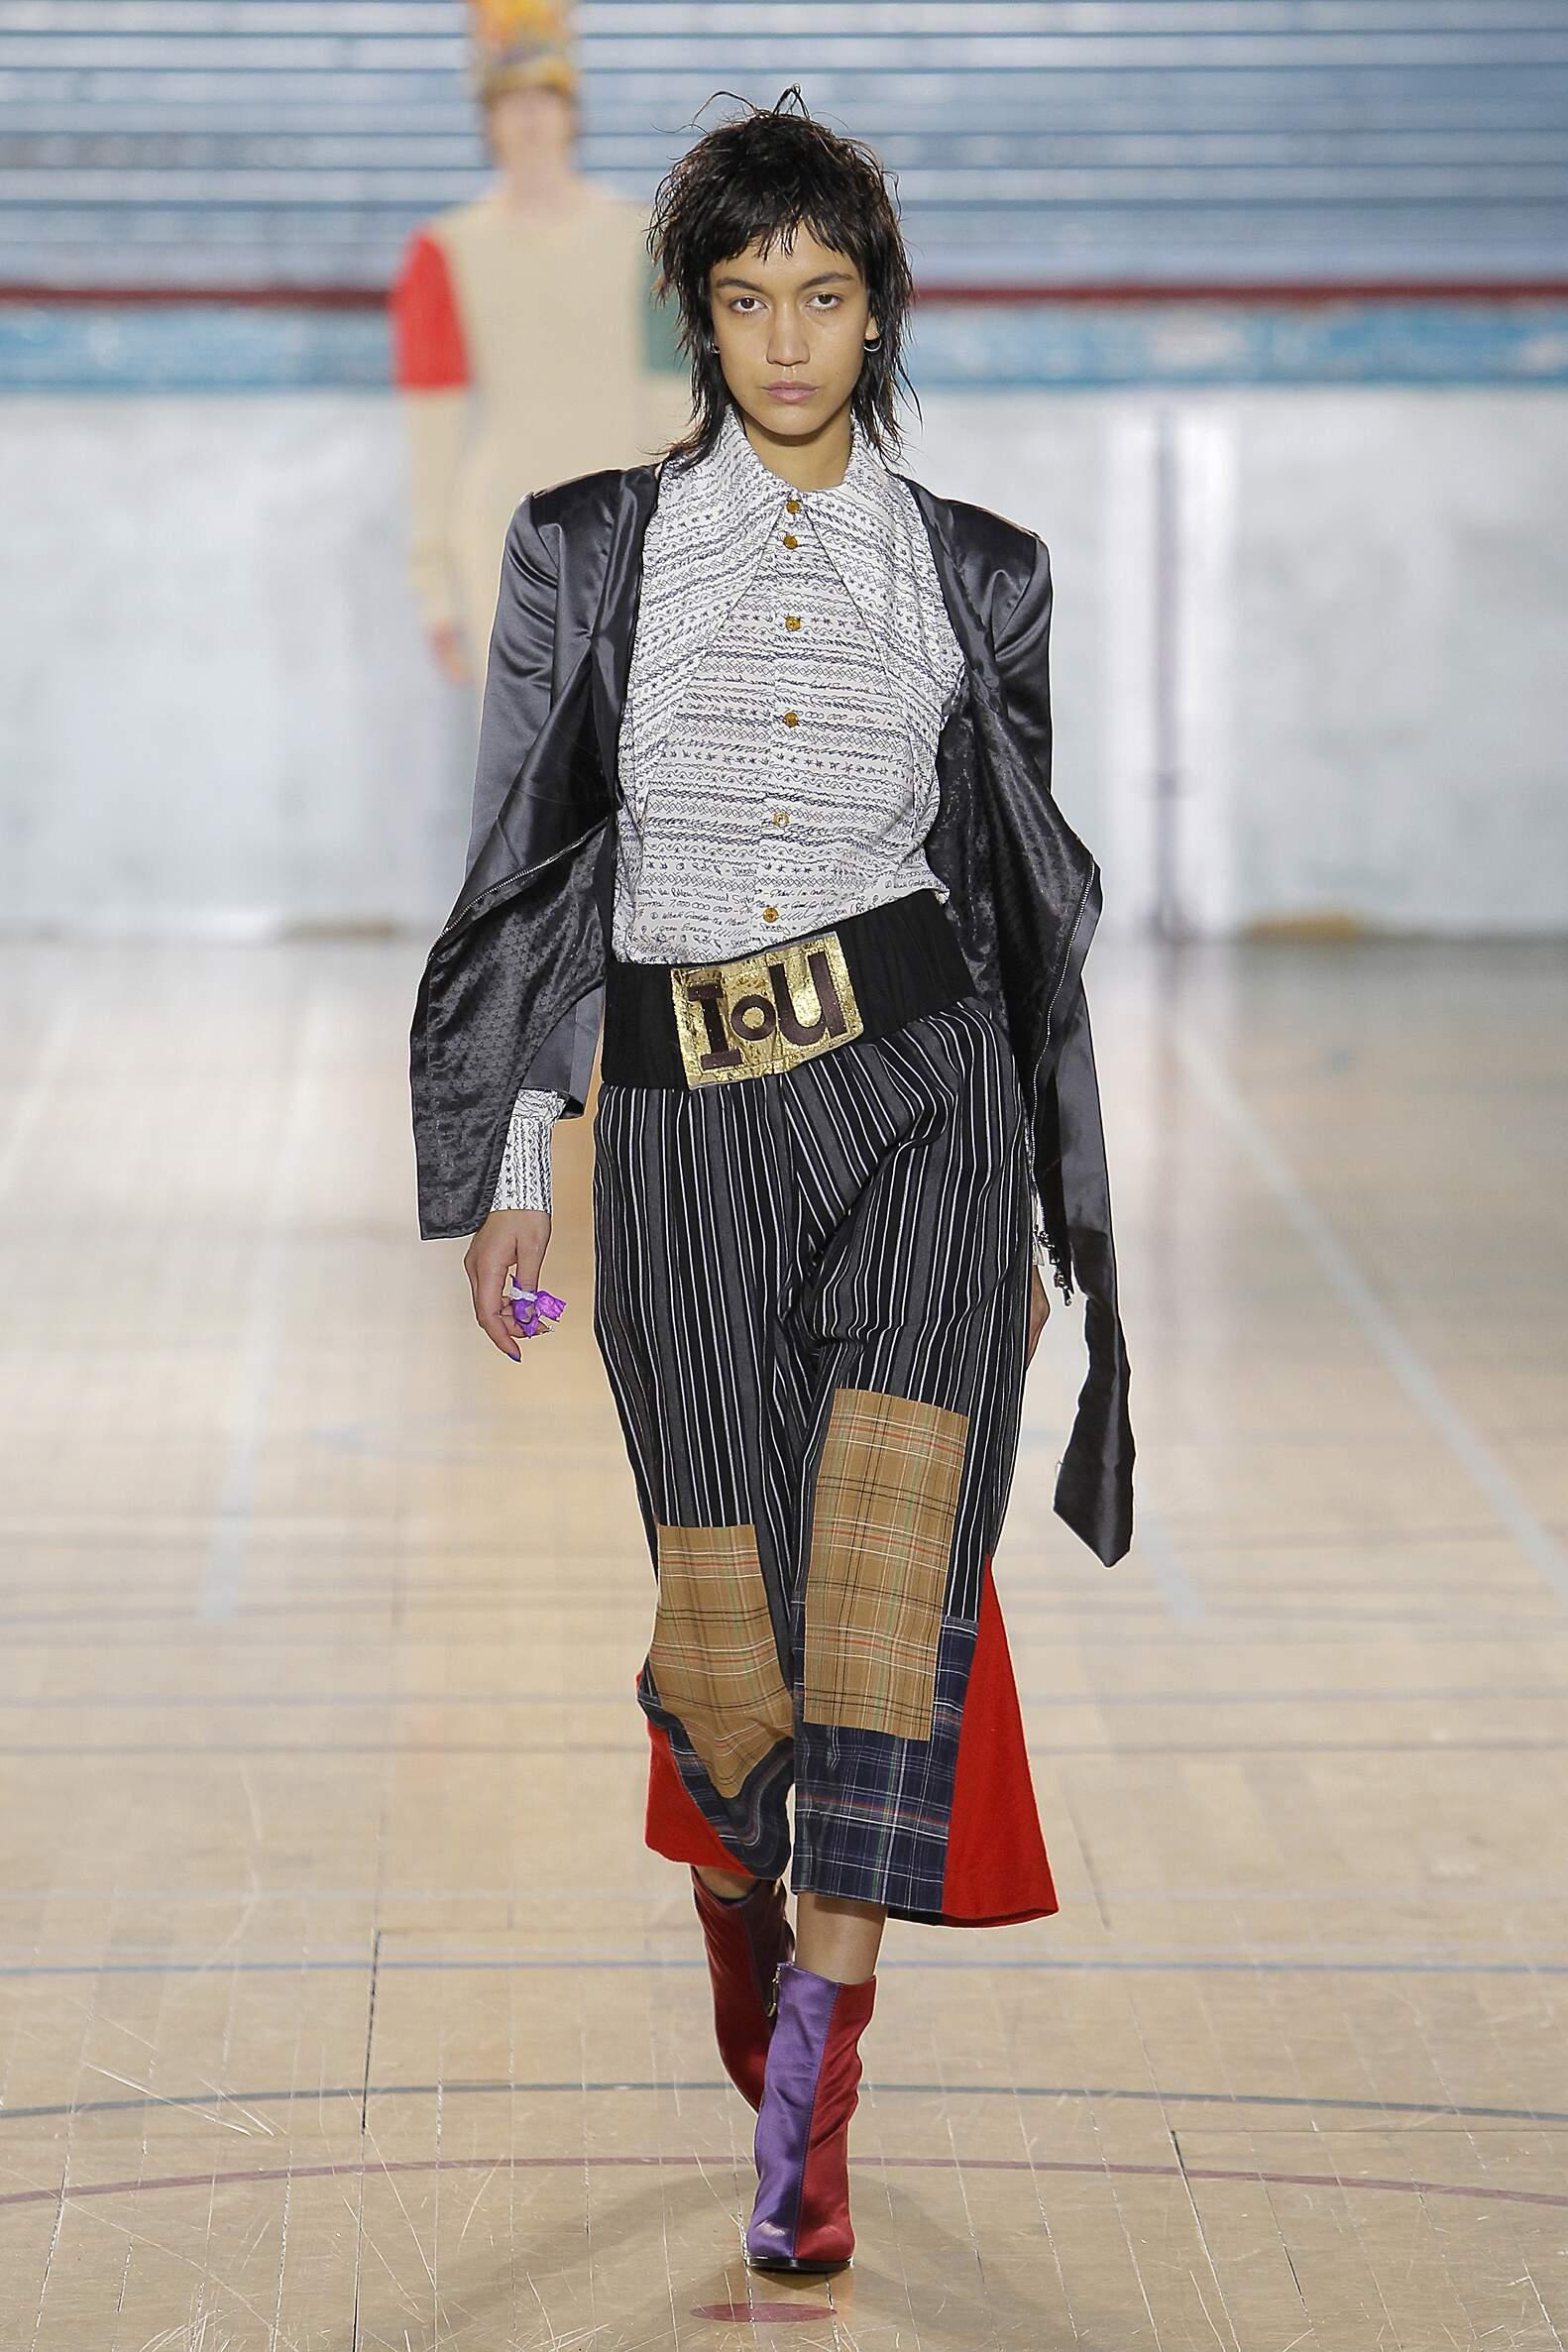 Woman FW 2017 Vivienne Westwood Fashion Show